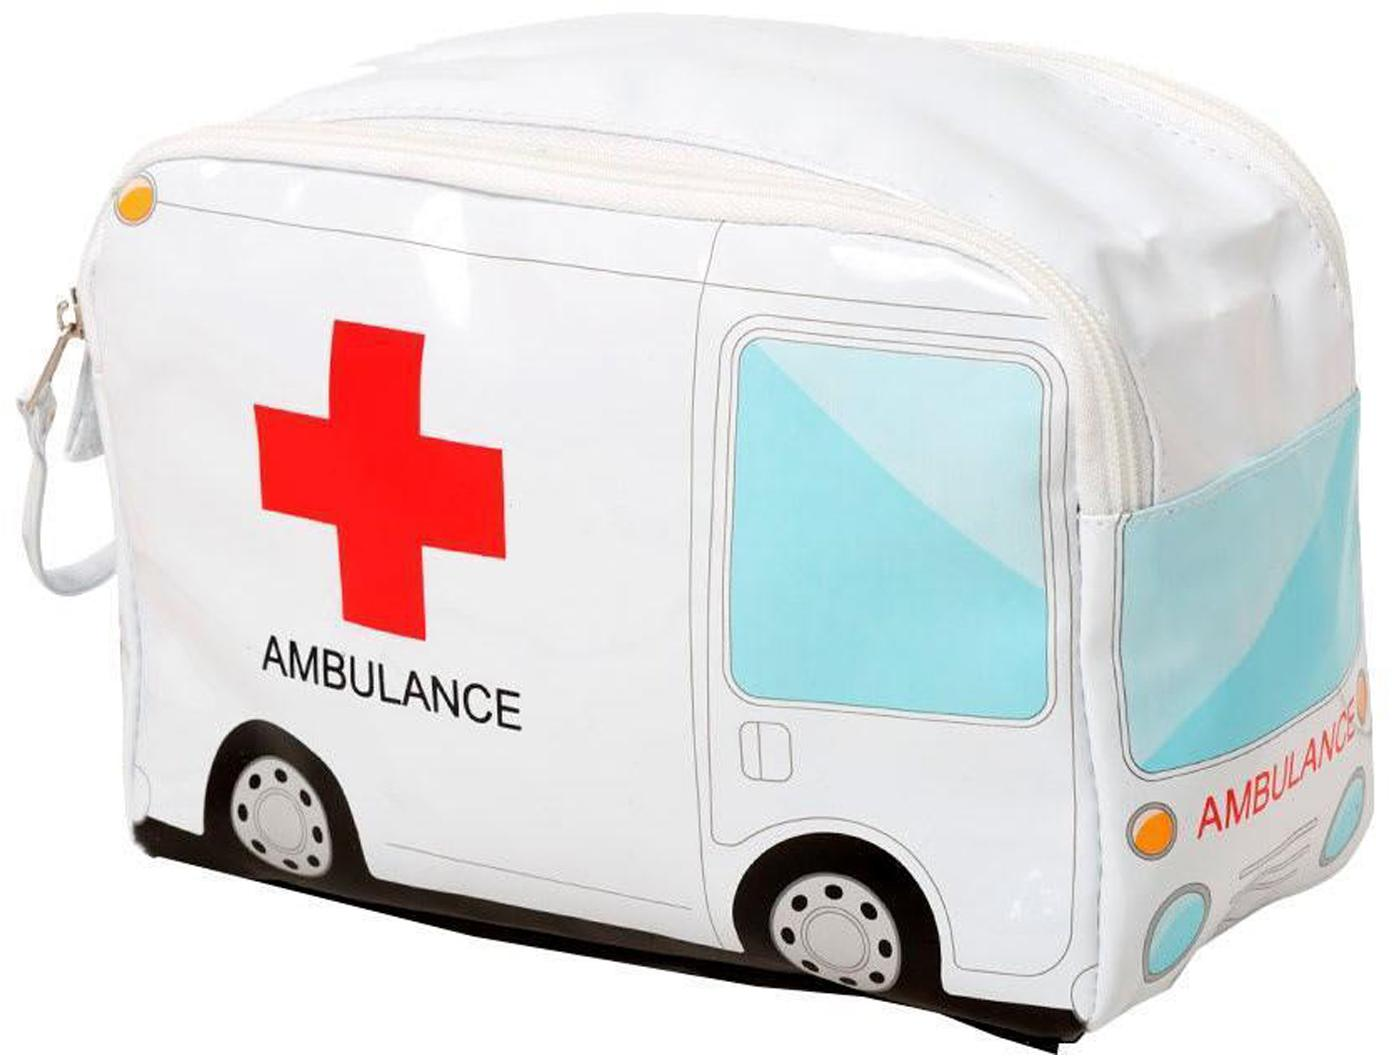 Neceser de primeros auxilios Ambulance, Tela, Blanco, rojo, azul, An 24 x Al 17 cm